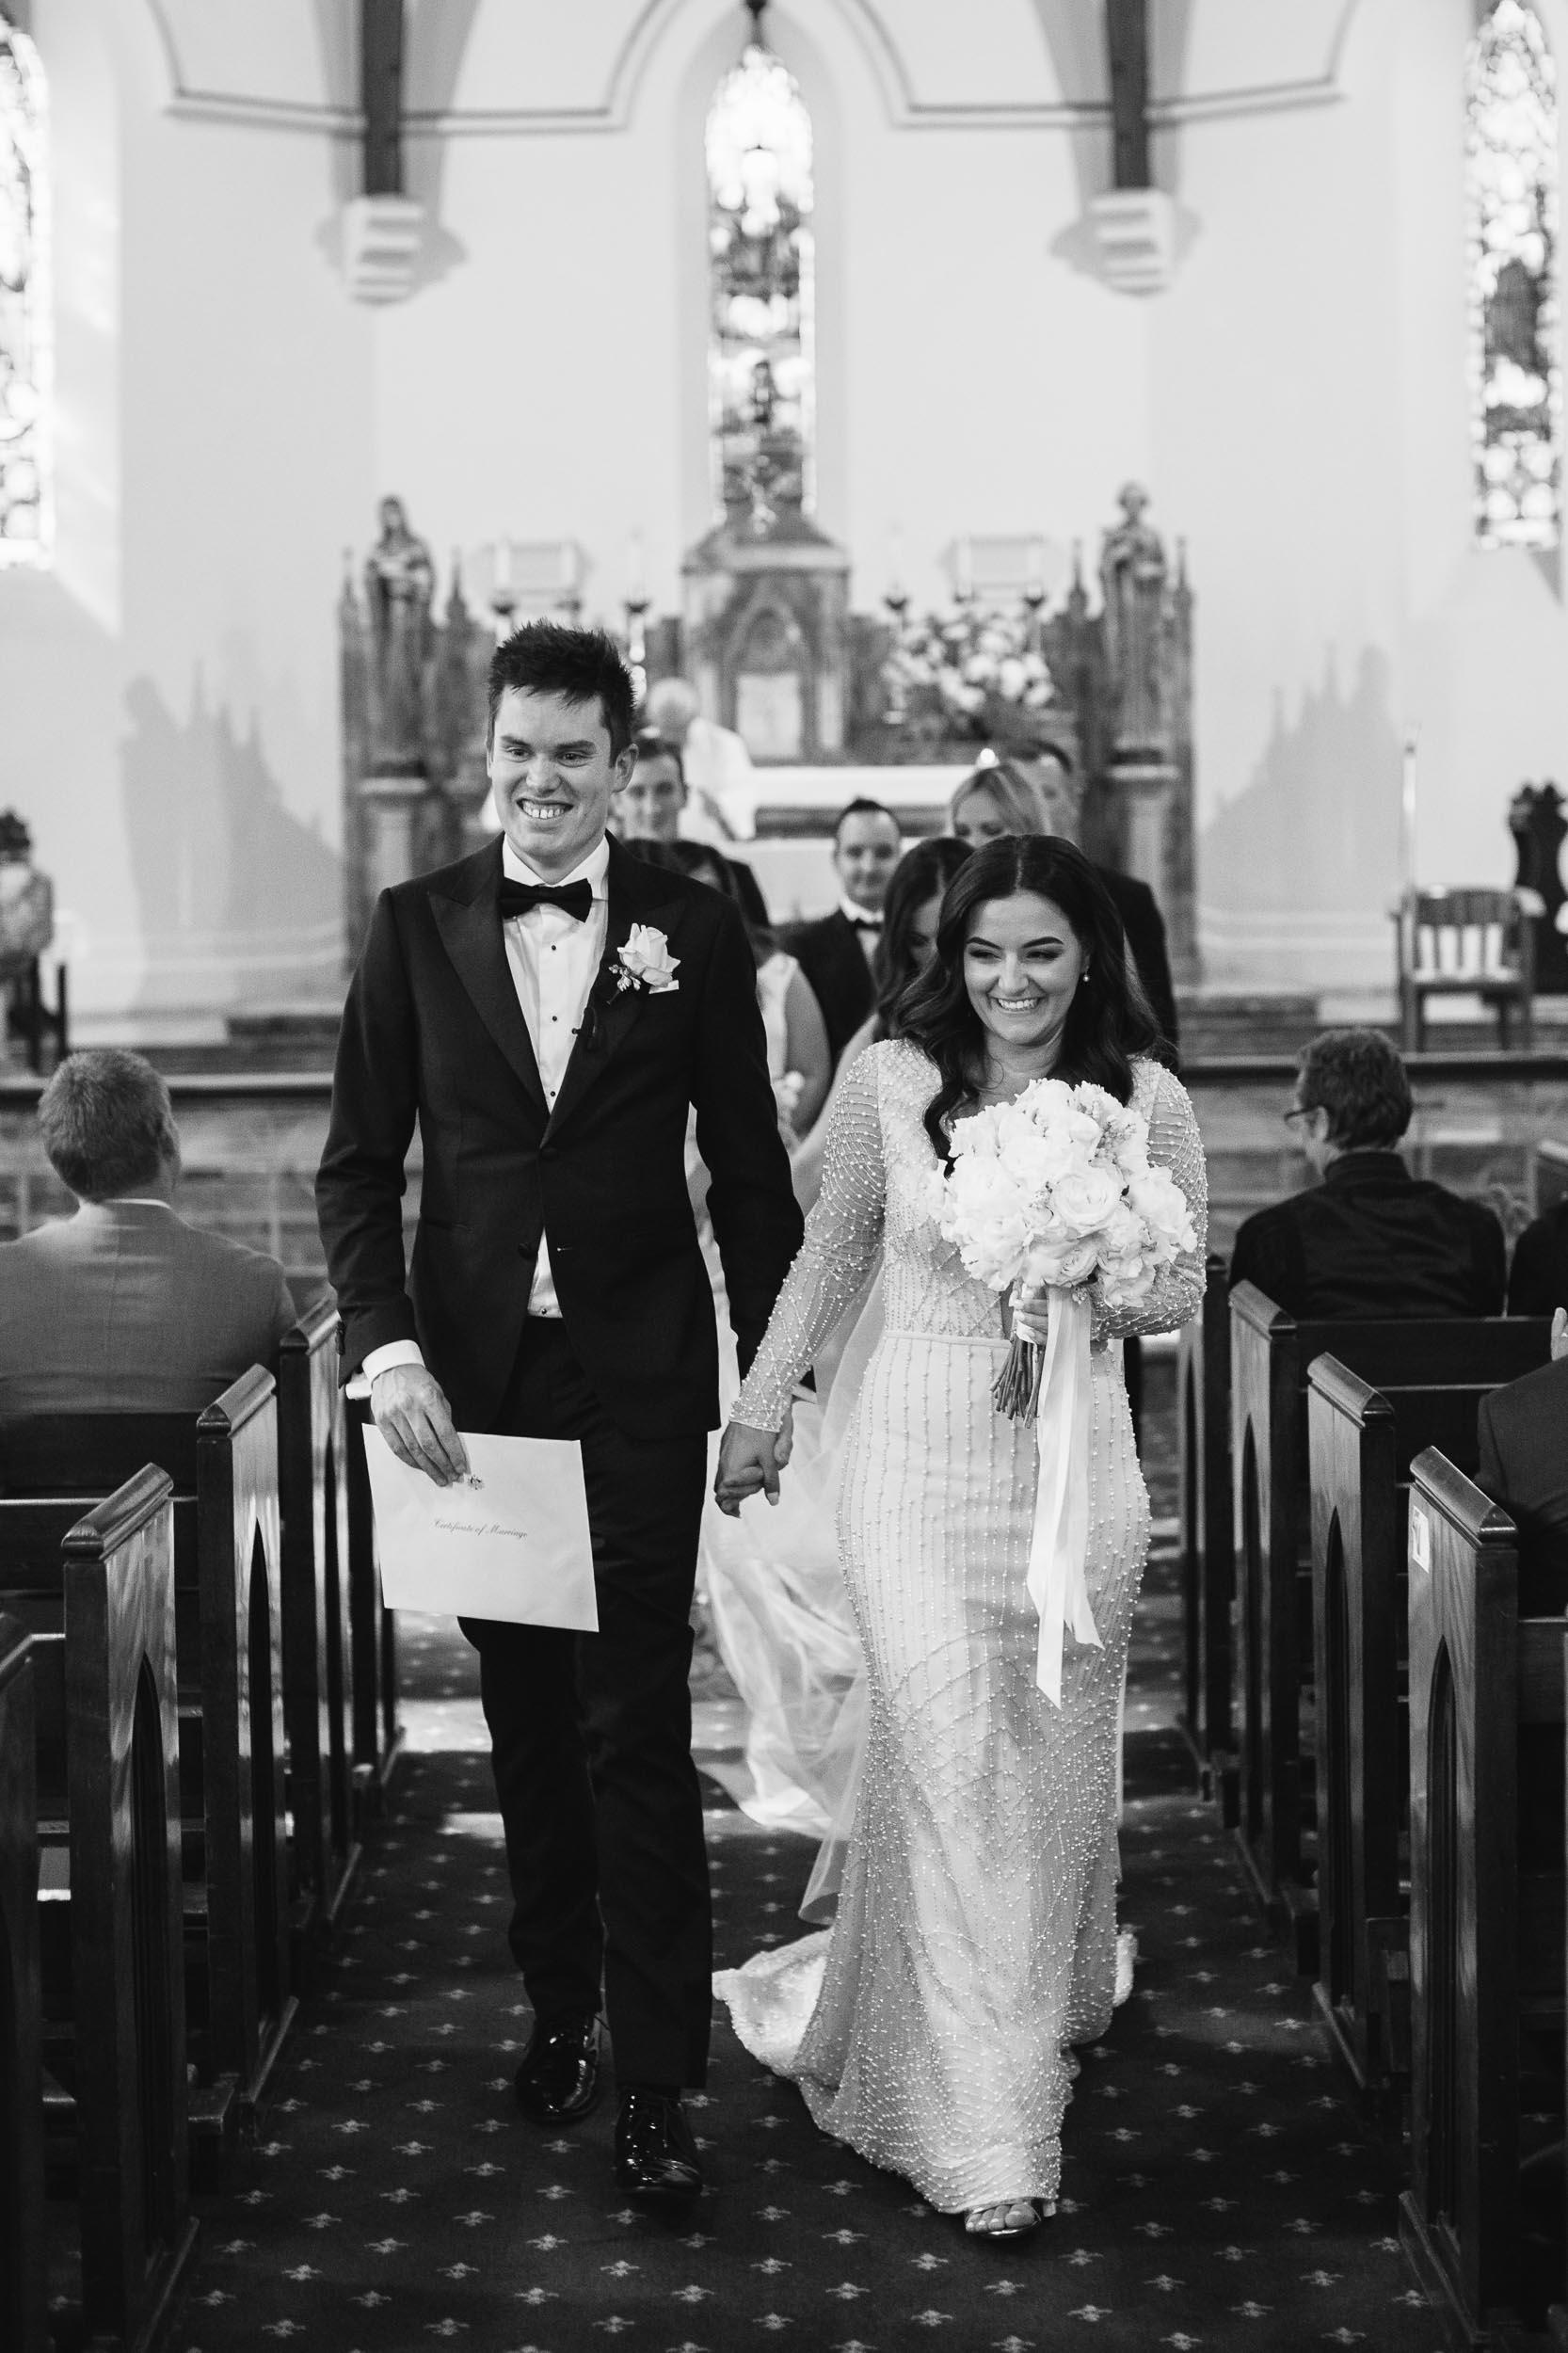 Kas-Richards-Wedding-Photographer-Melbourne-City-Wedding-Alto-Event-Space-Jane-Hill-Bridal-Gown-34.jpg